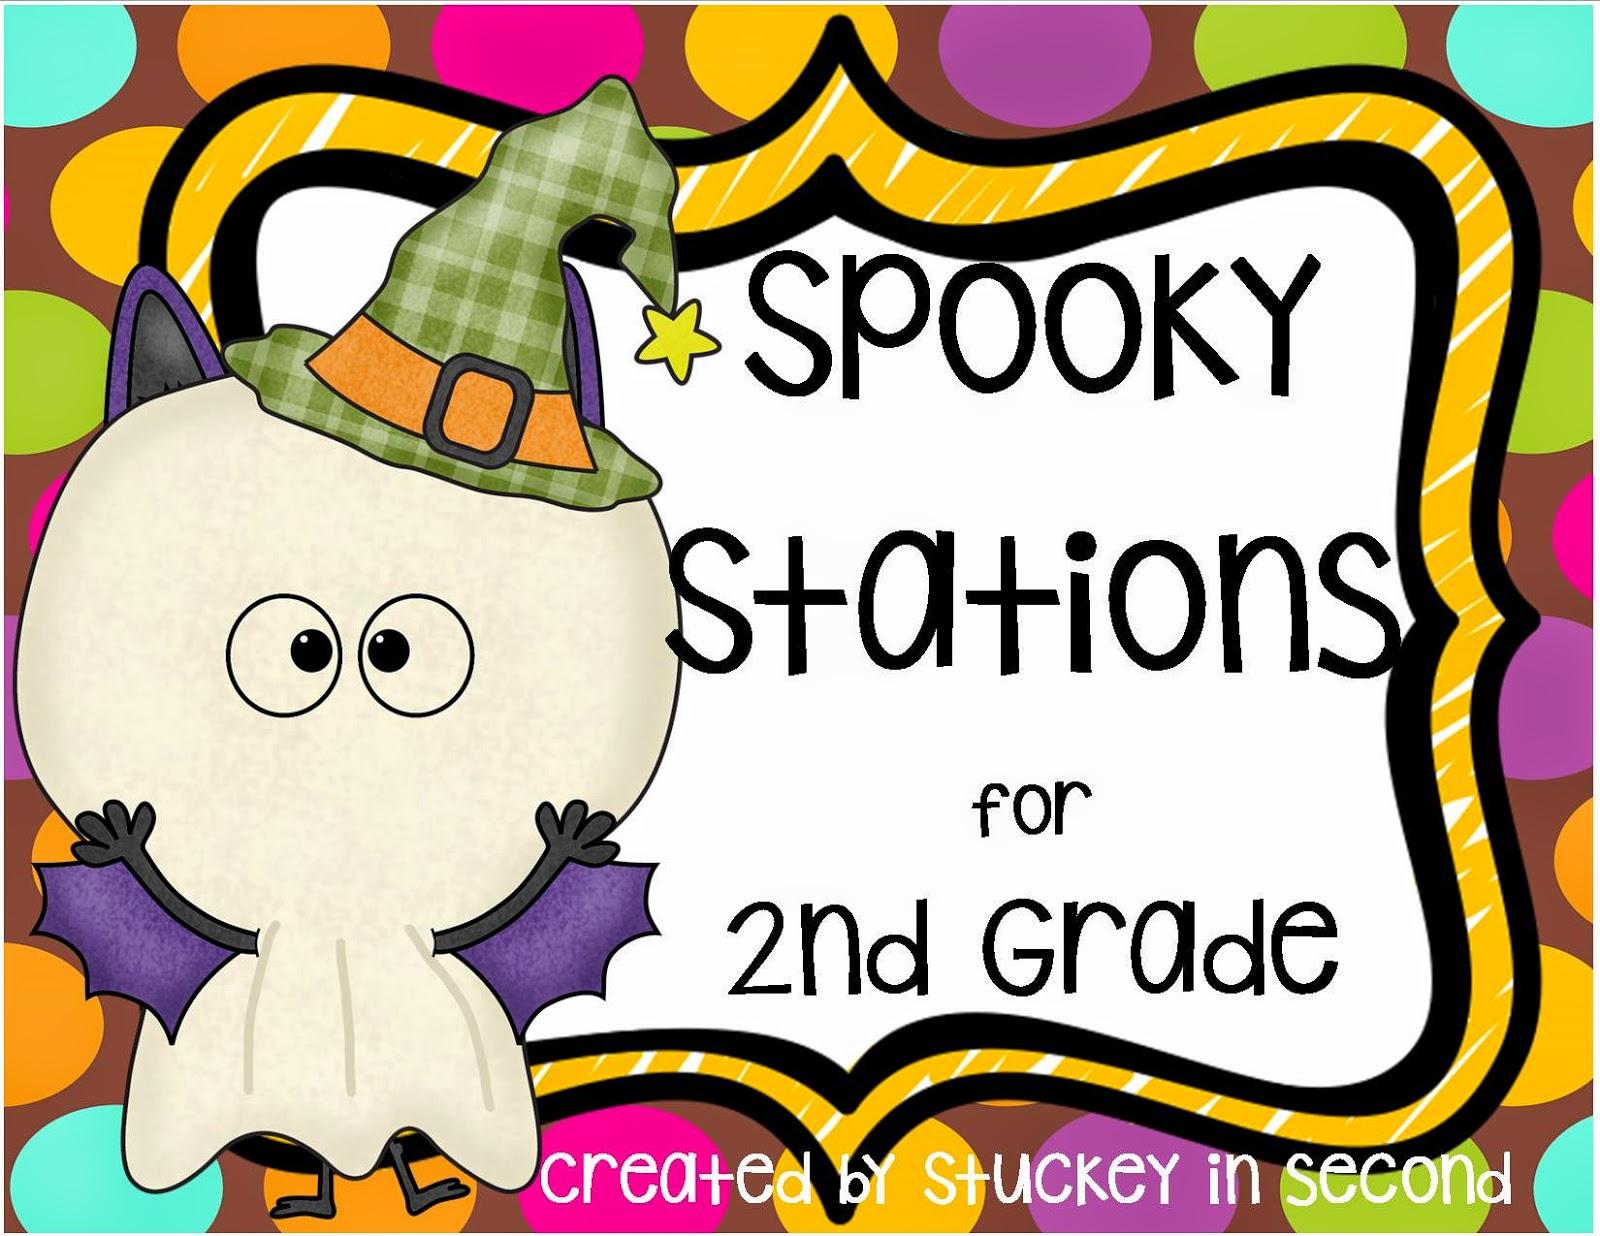 http://www.teacherspayteachers.com/Product/Spooky-Stations-for-2nd-Grade-6-Math-Centers-1450439